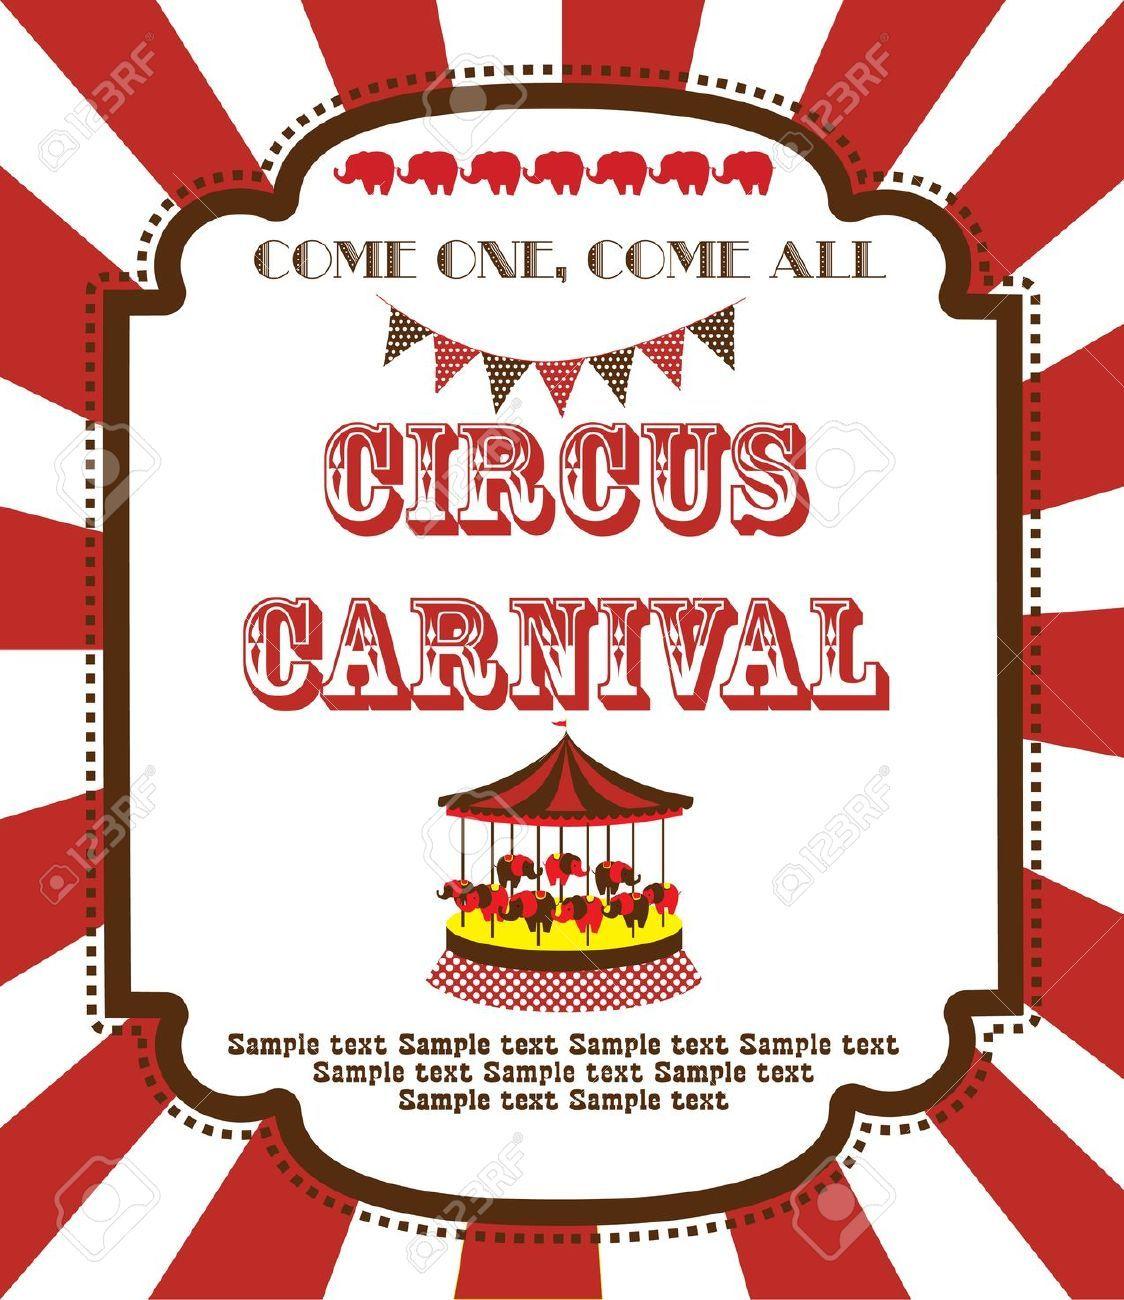 Free Circus Clip Art Borders